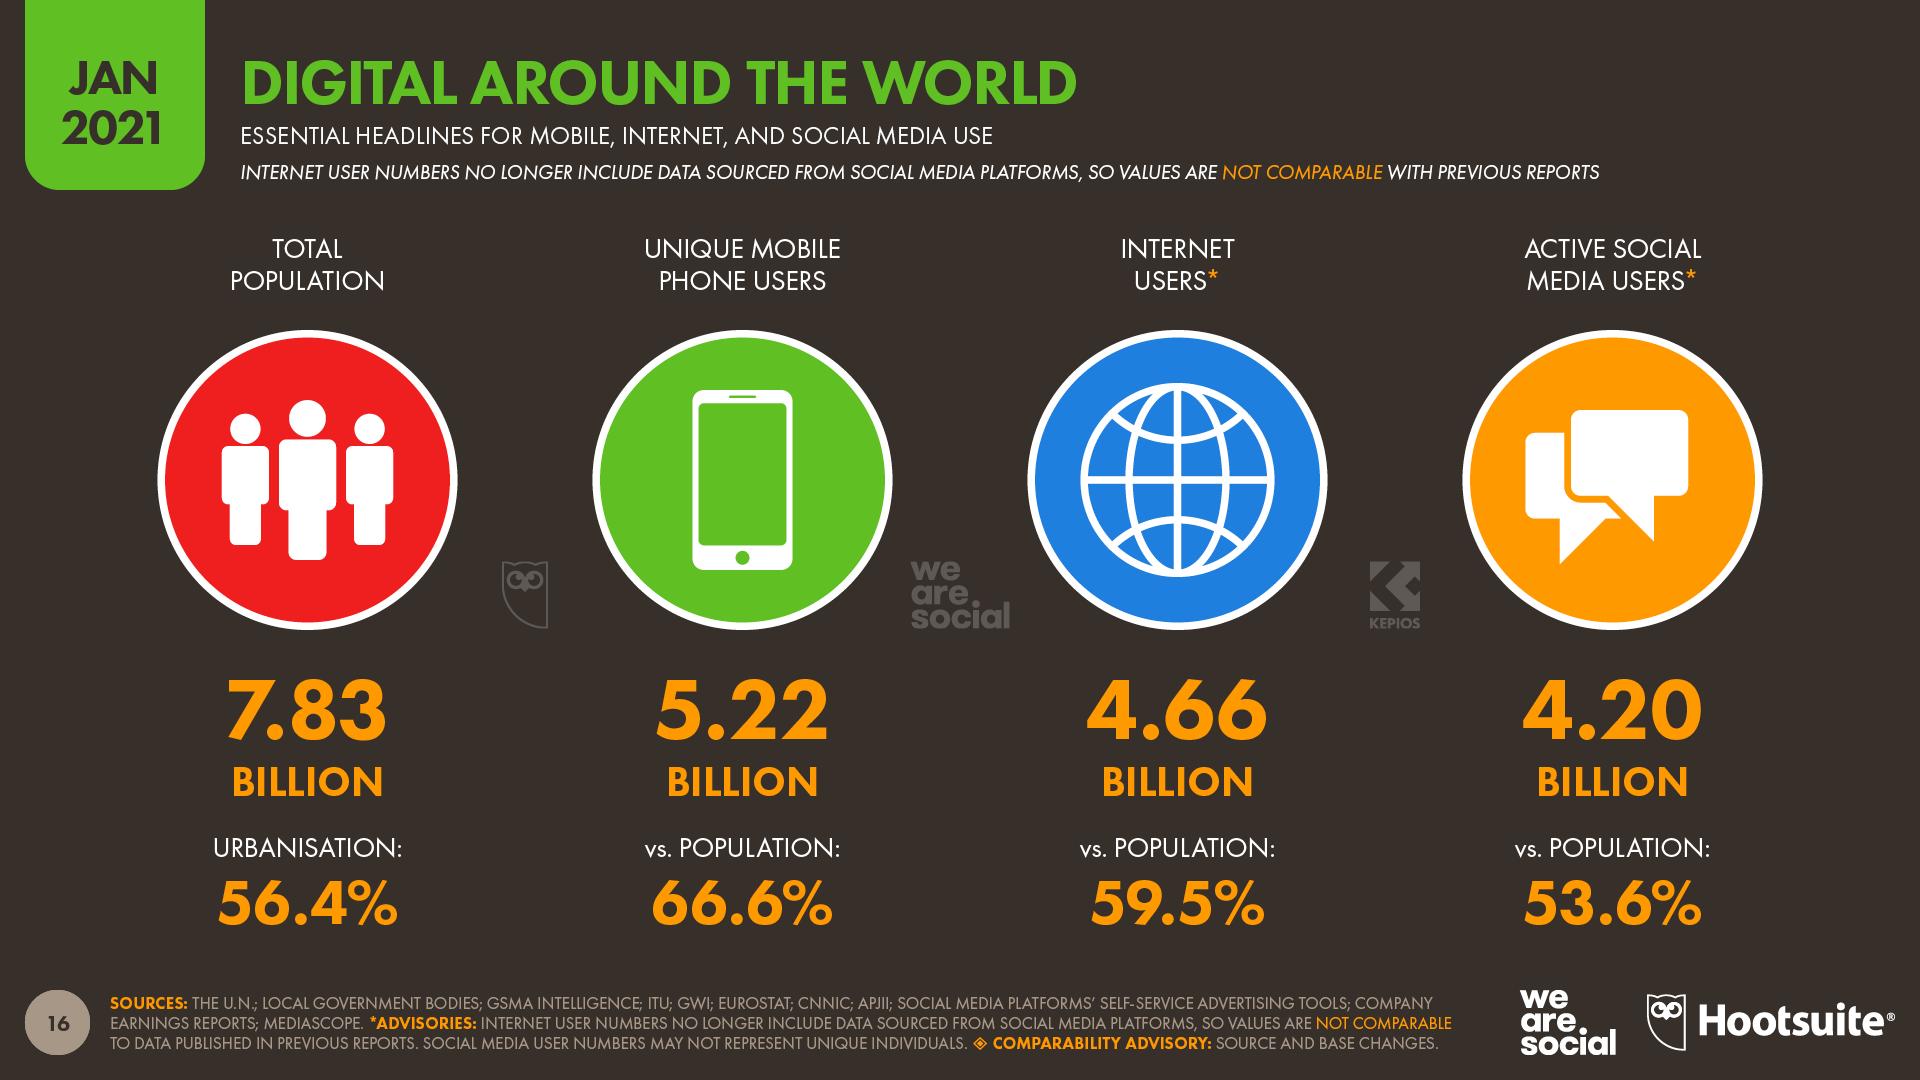 Global Digital Overview January 2021 DataReportal